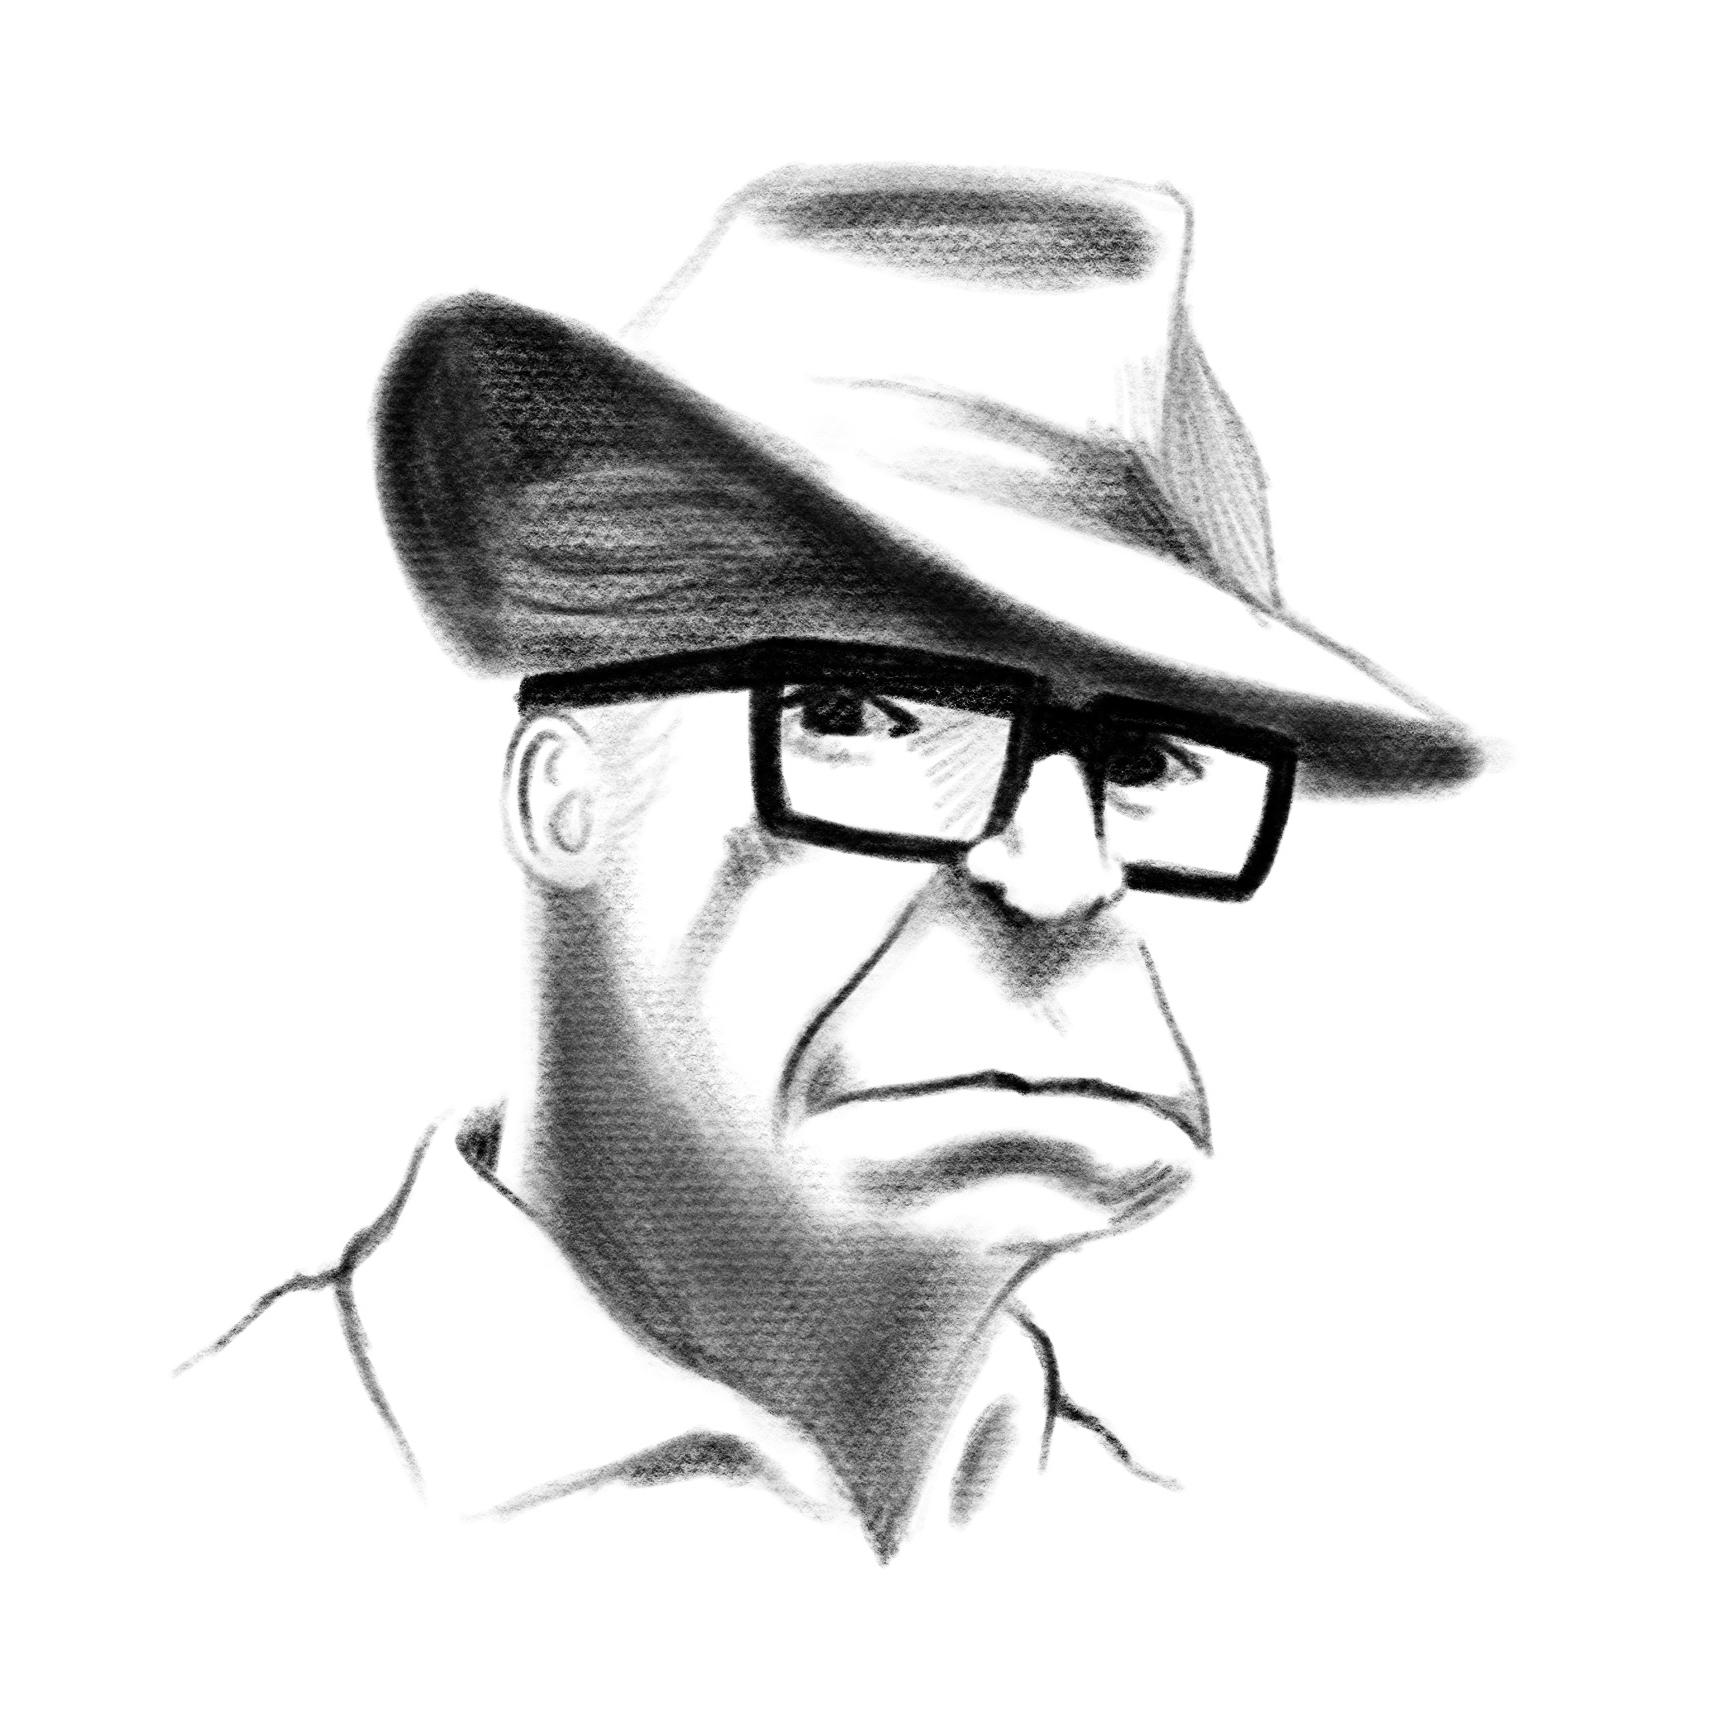 Billy Wilder portrait by the always cool Hugo Marmugi